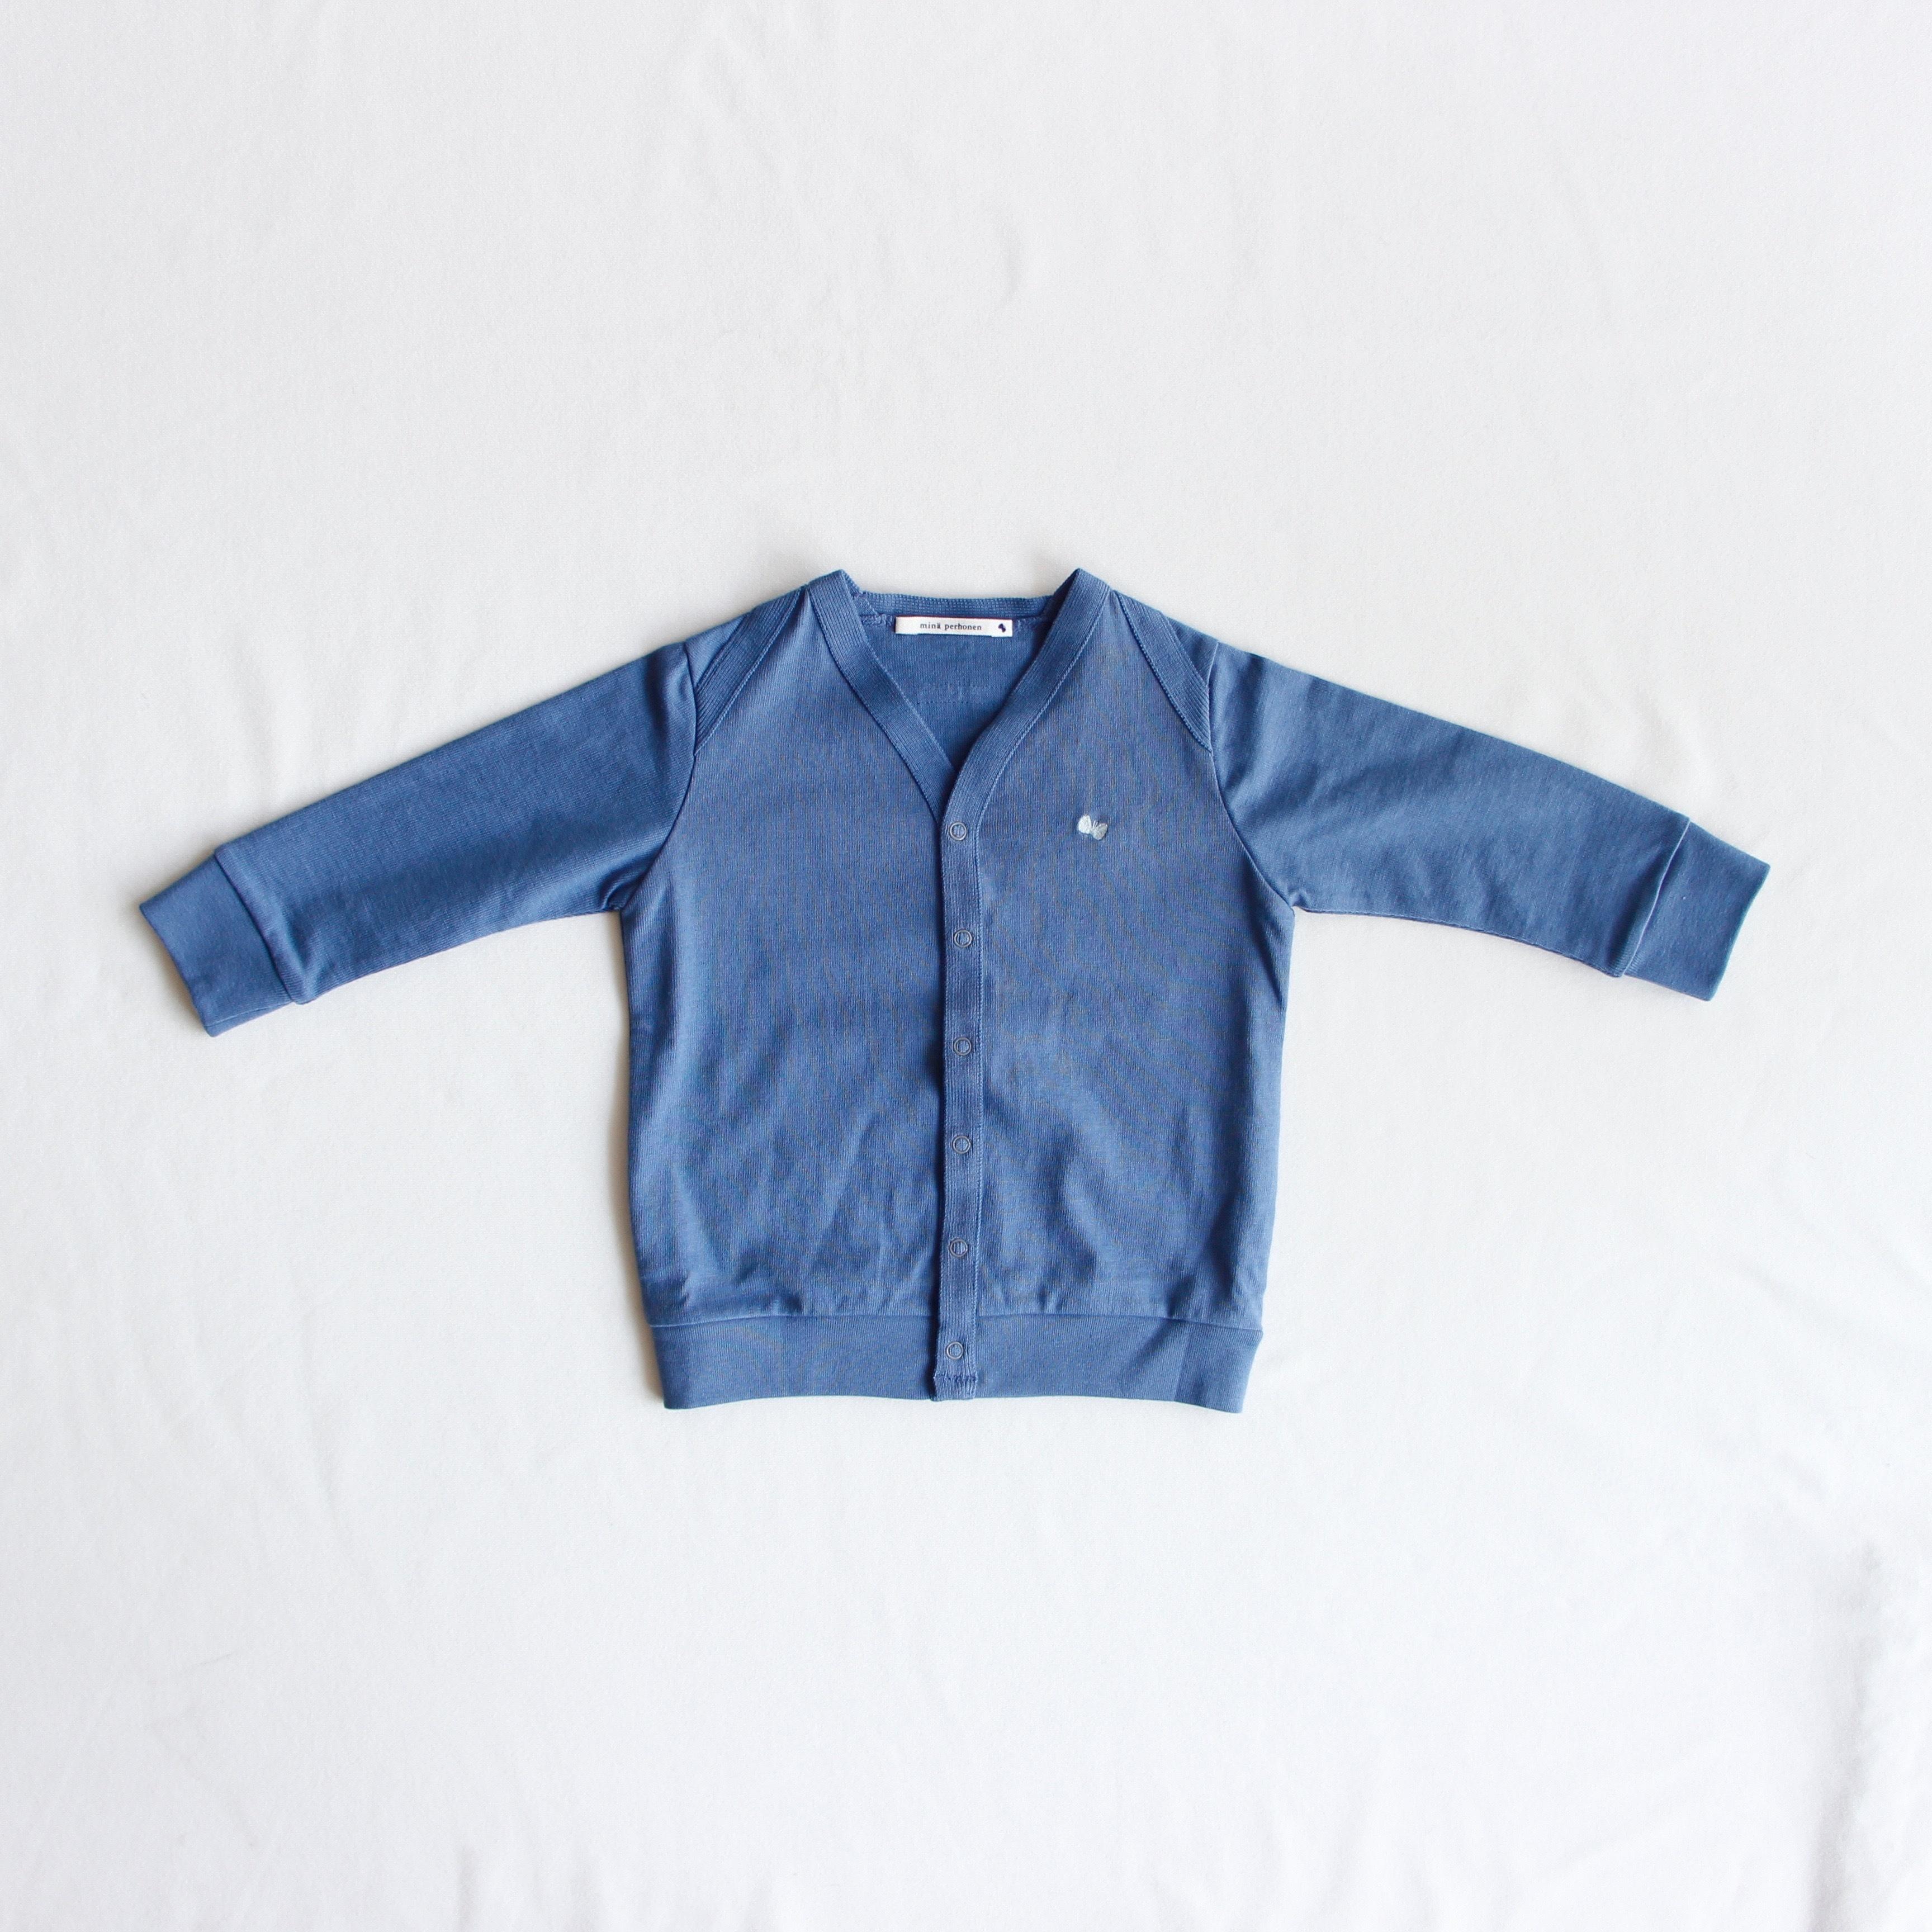 《mina perhonen 2018AW》zutto カーディガン / blue / 110-130cm